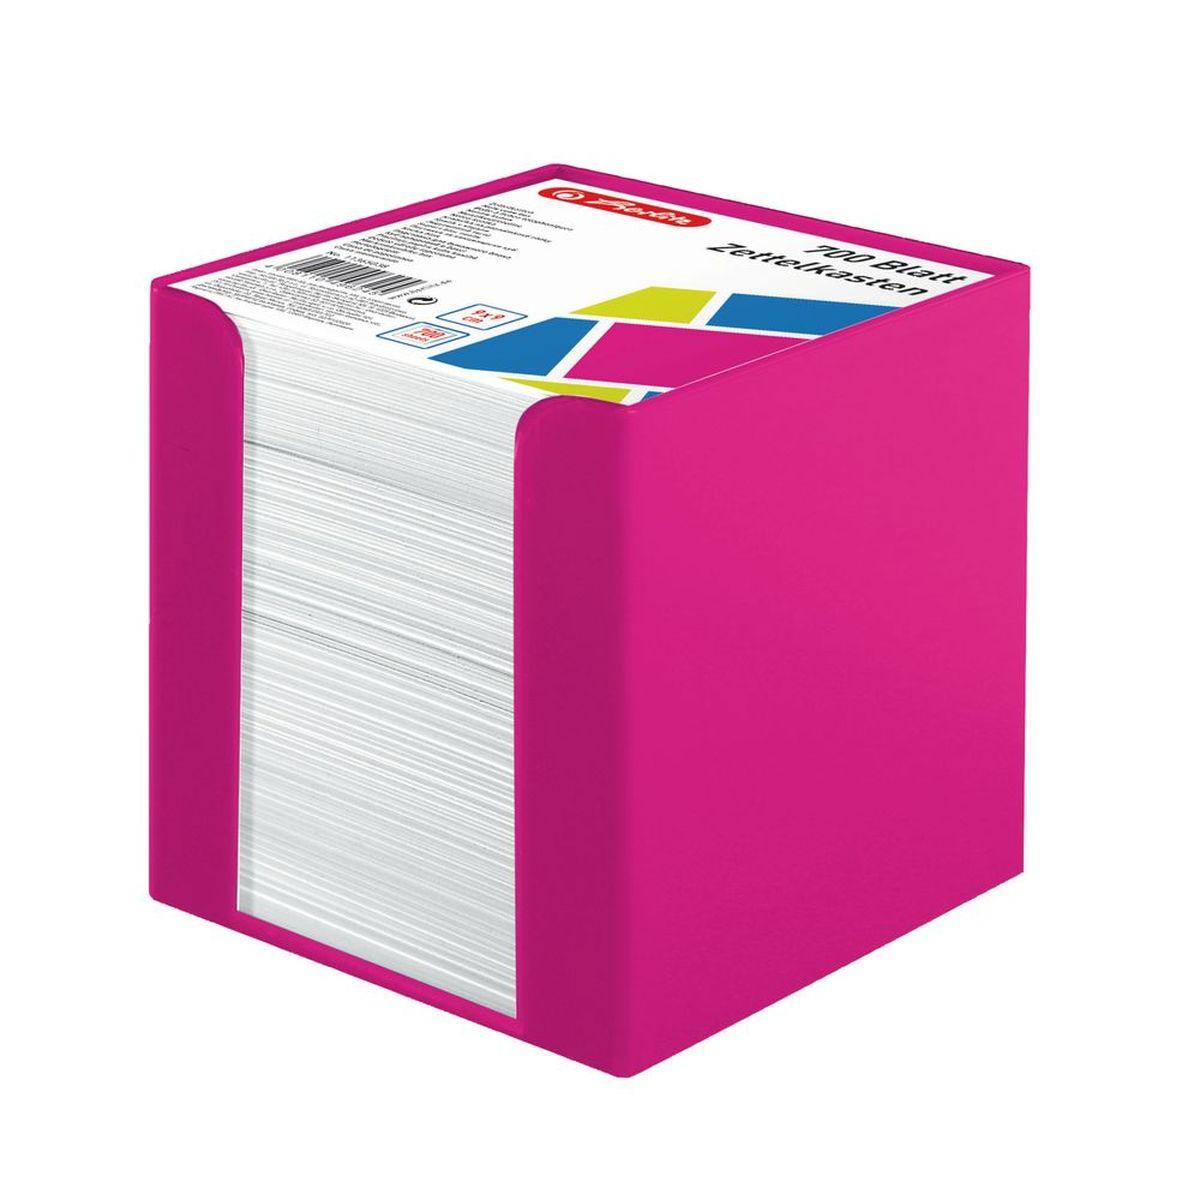 Herlitz Бумага для заметок Colour Blocking цвет подставки розовый